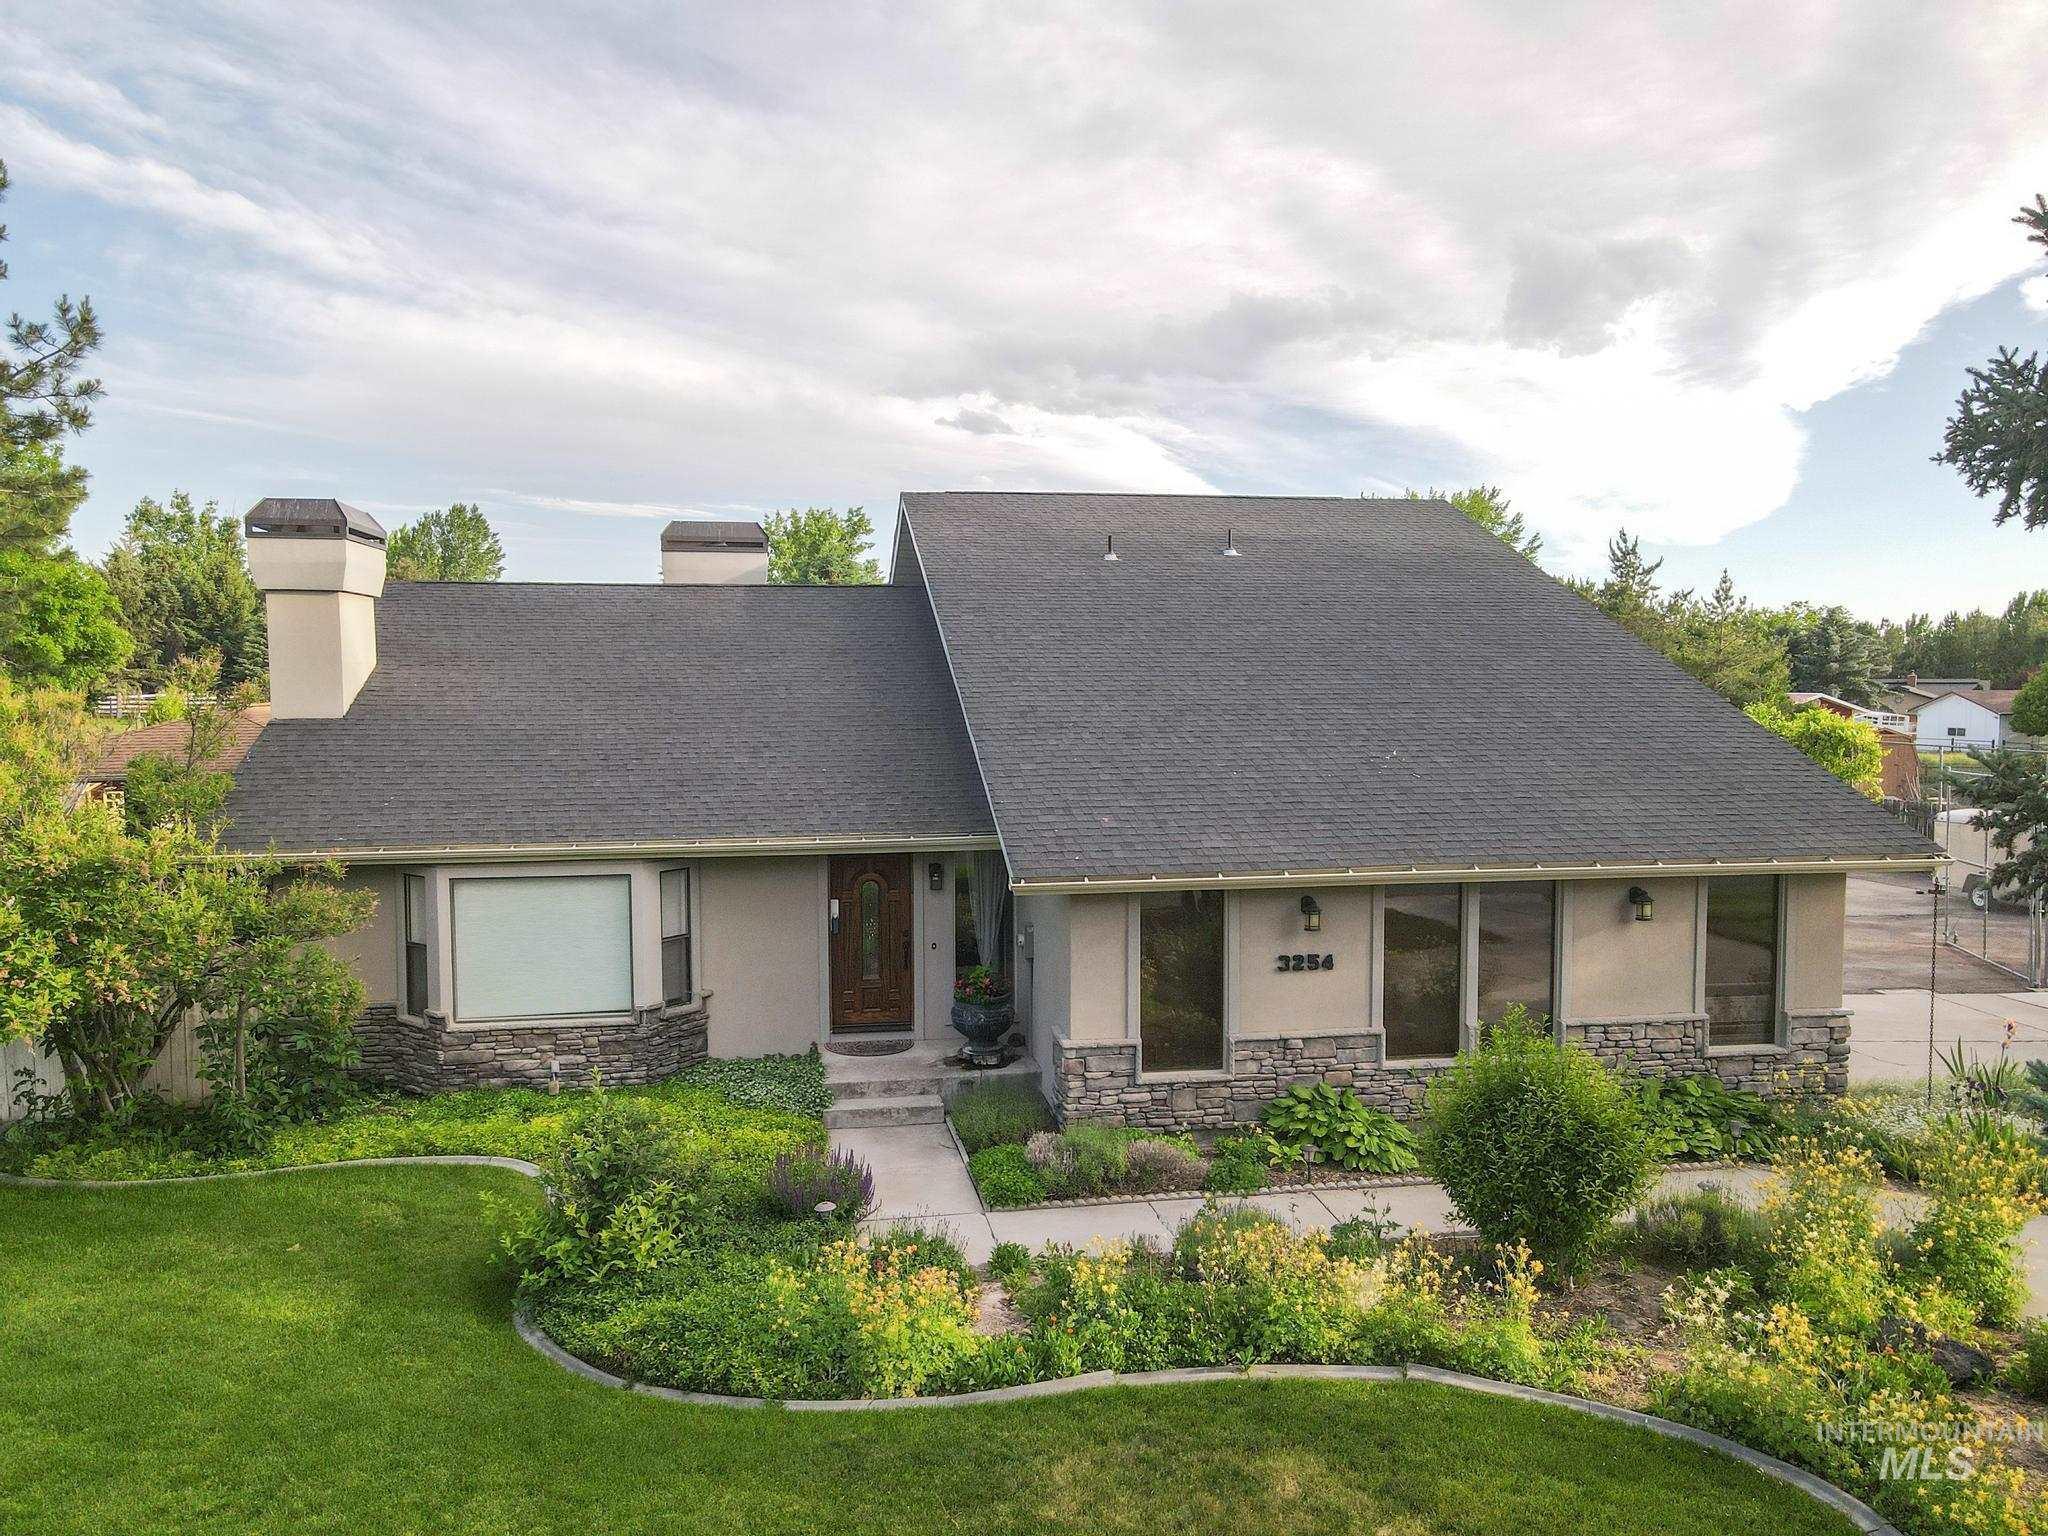 3254 Woodridge Dr Property Photo 1